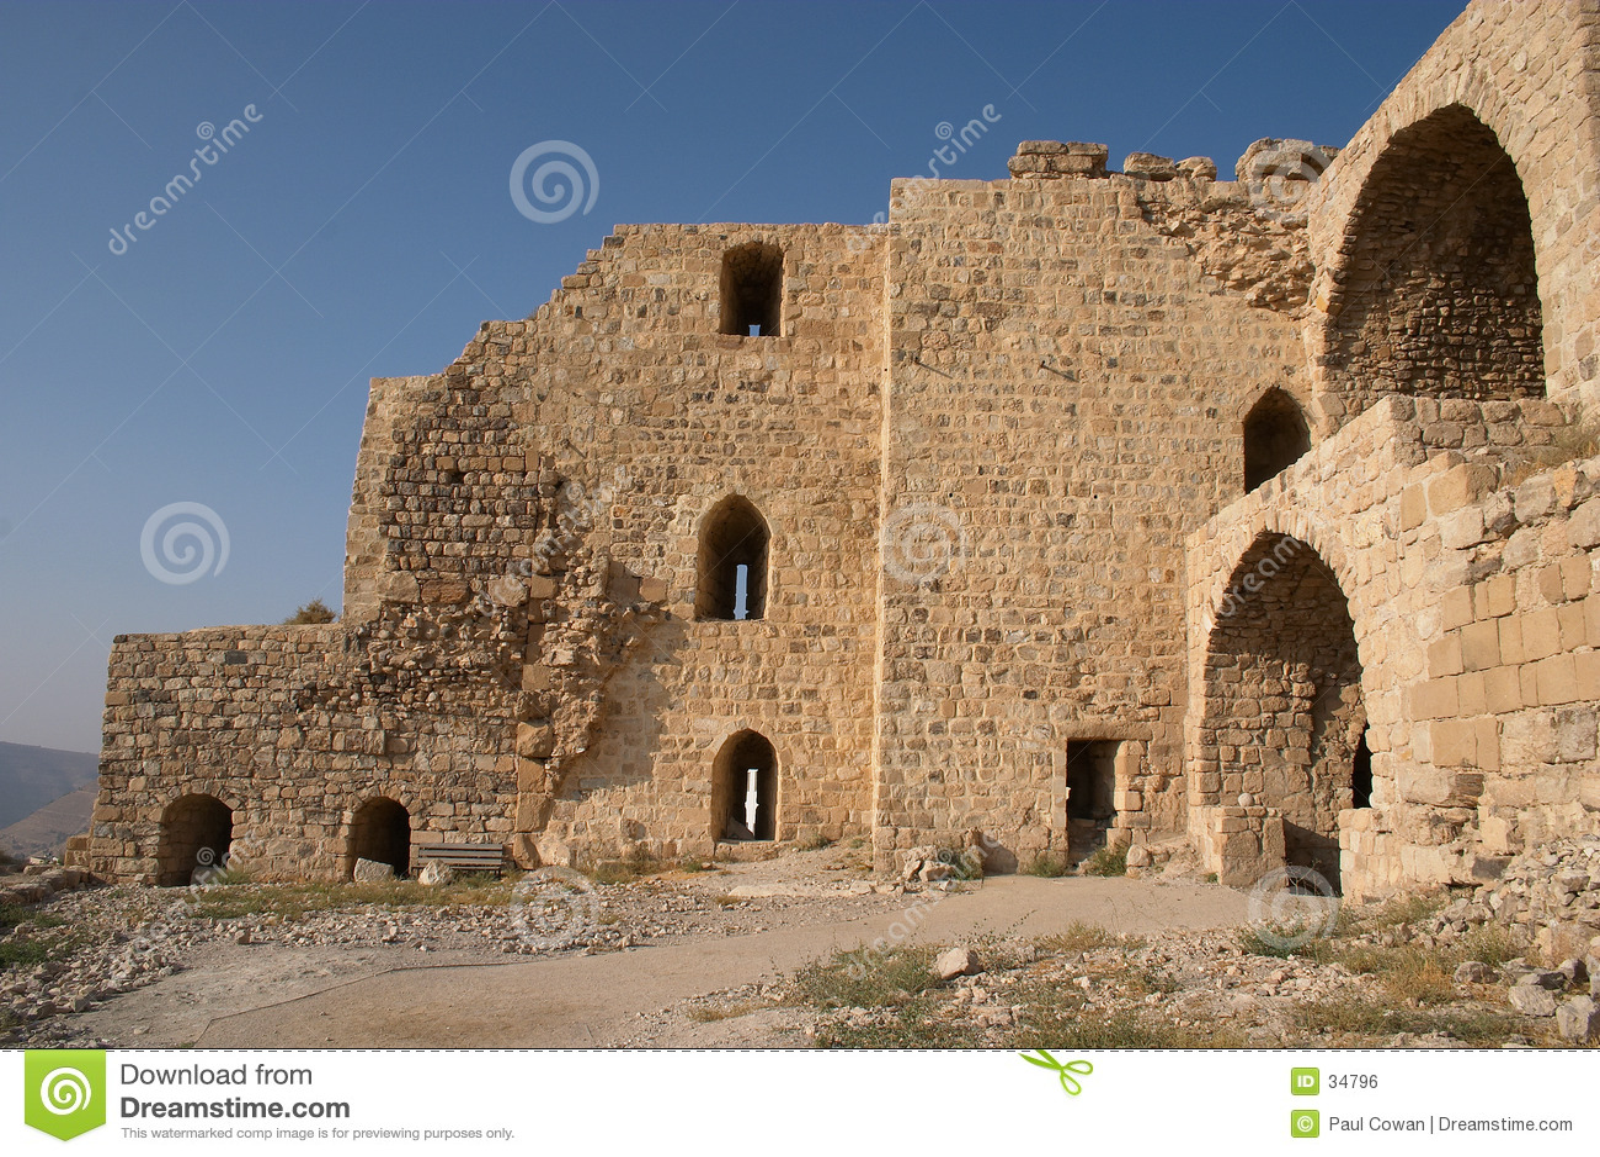 Karak castle ruins